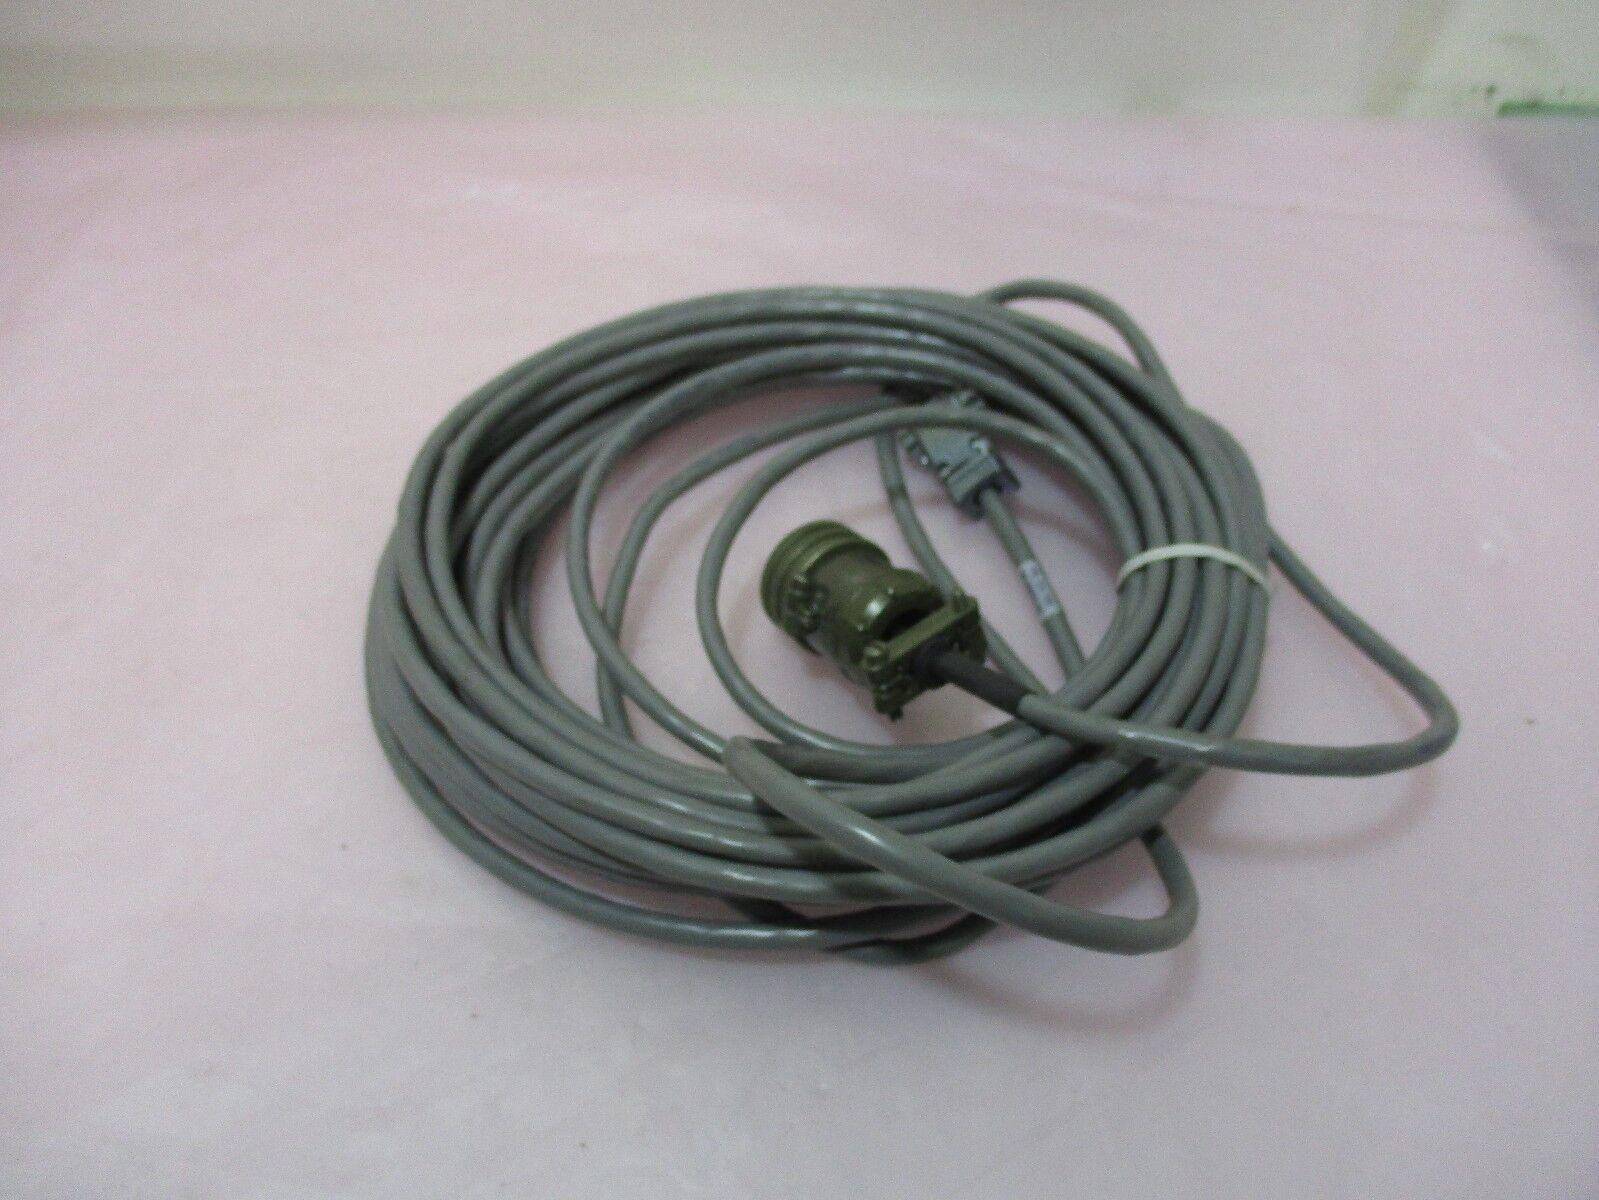 Novellus 03-00075-02, Cable Assembly, CA100, 45ft, J20 CA-100, PH/L 4106. 418005